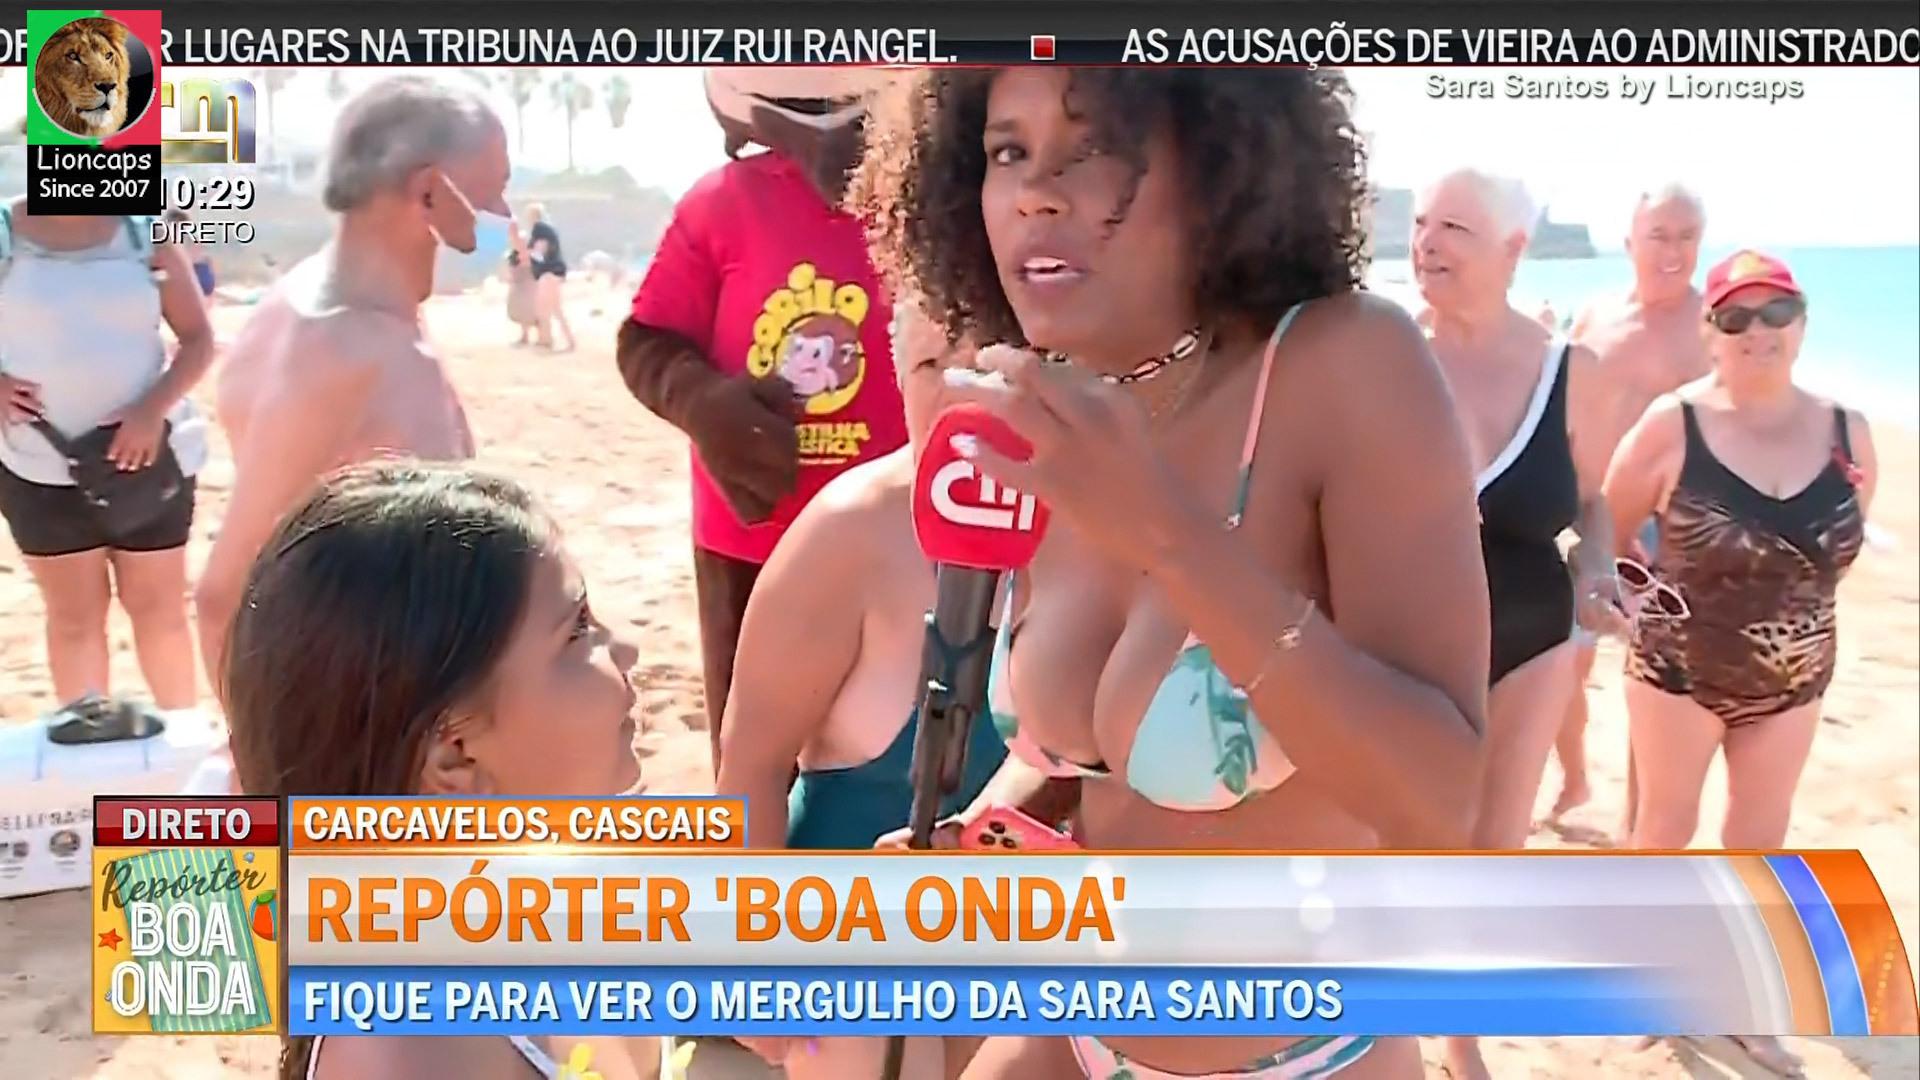 sara_santos_praia_lioncaps_24_07_2021_01 (11).jpg